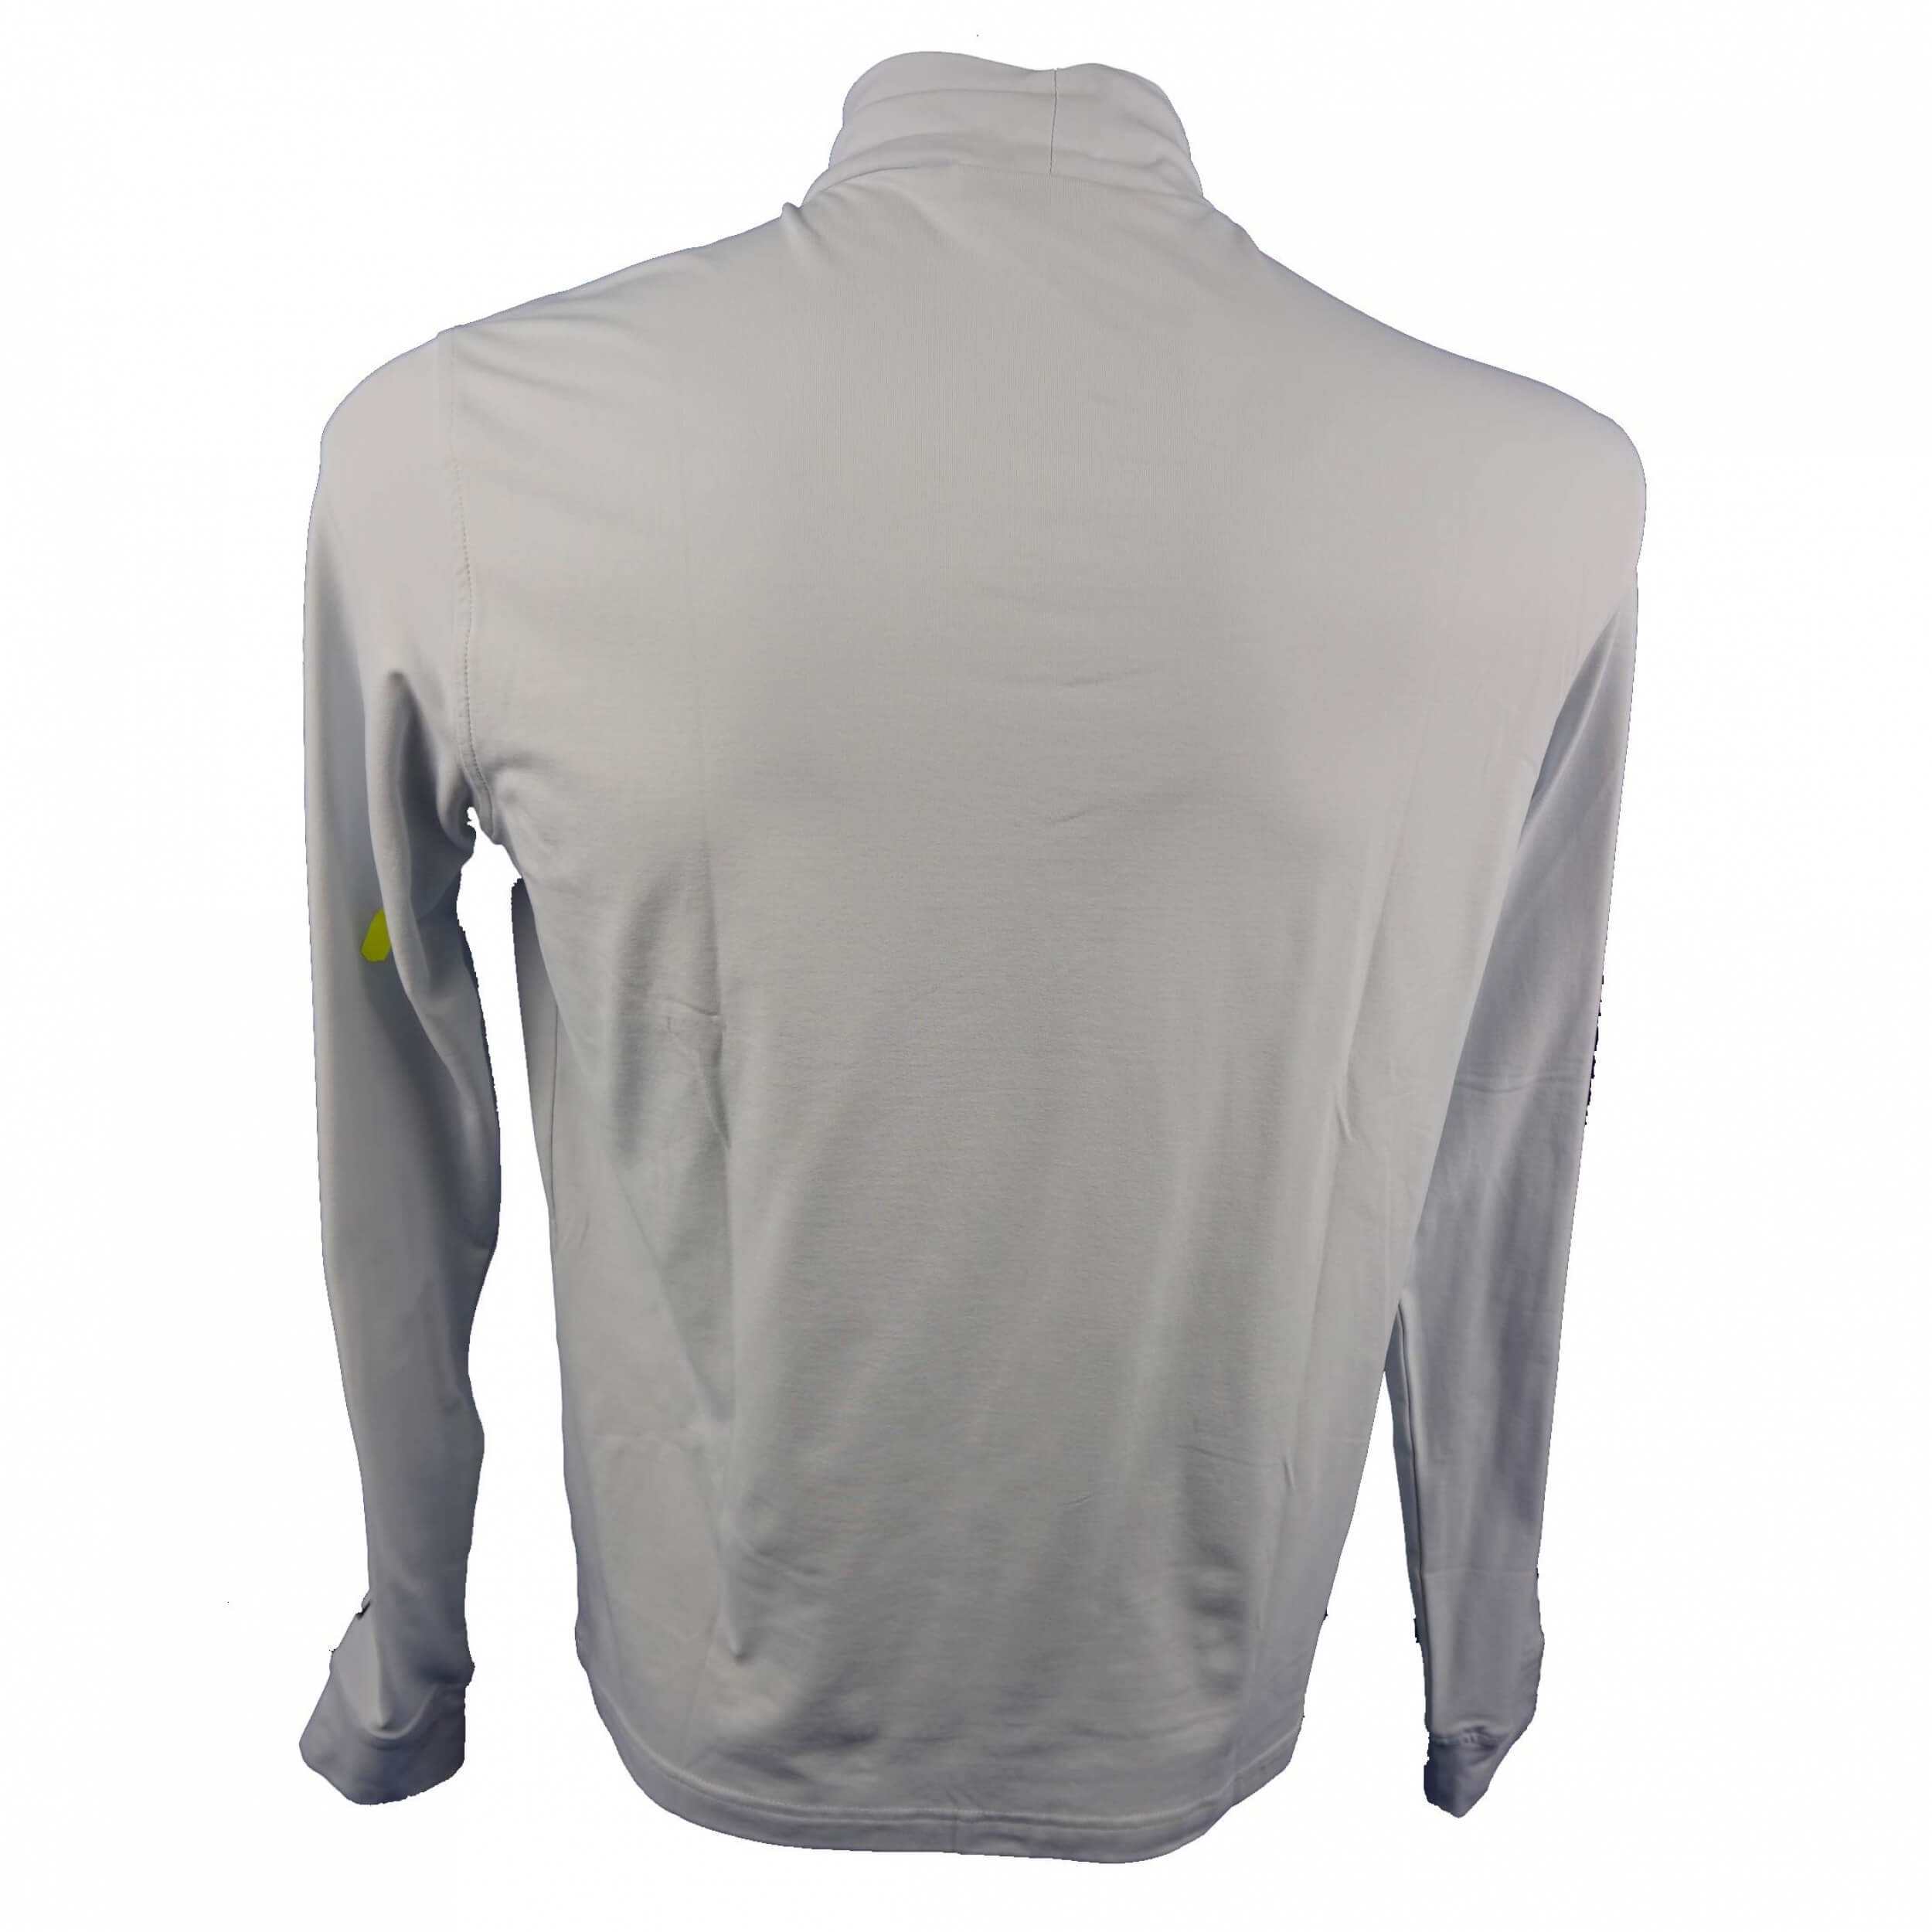 Chervo Herren Shirt Rolli Takione grau 2.Wahl